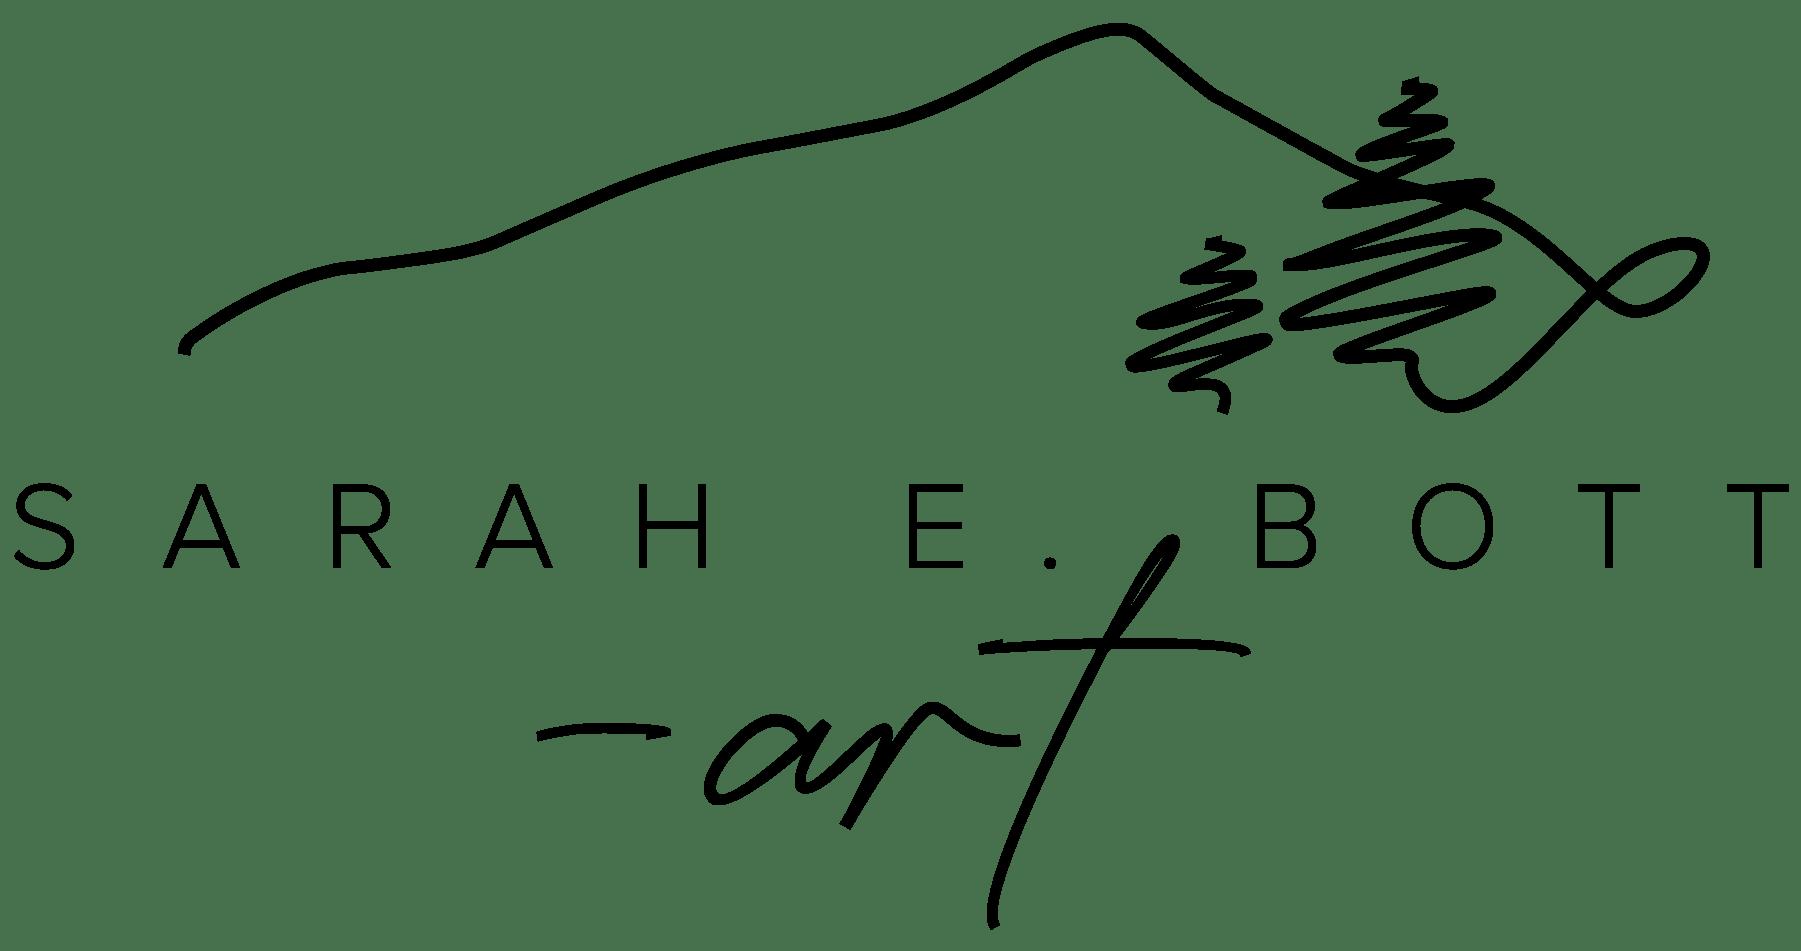 Sarah E. Bott Art